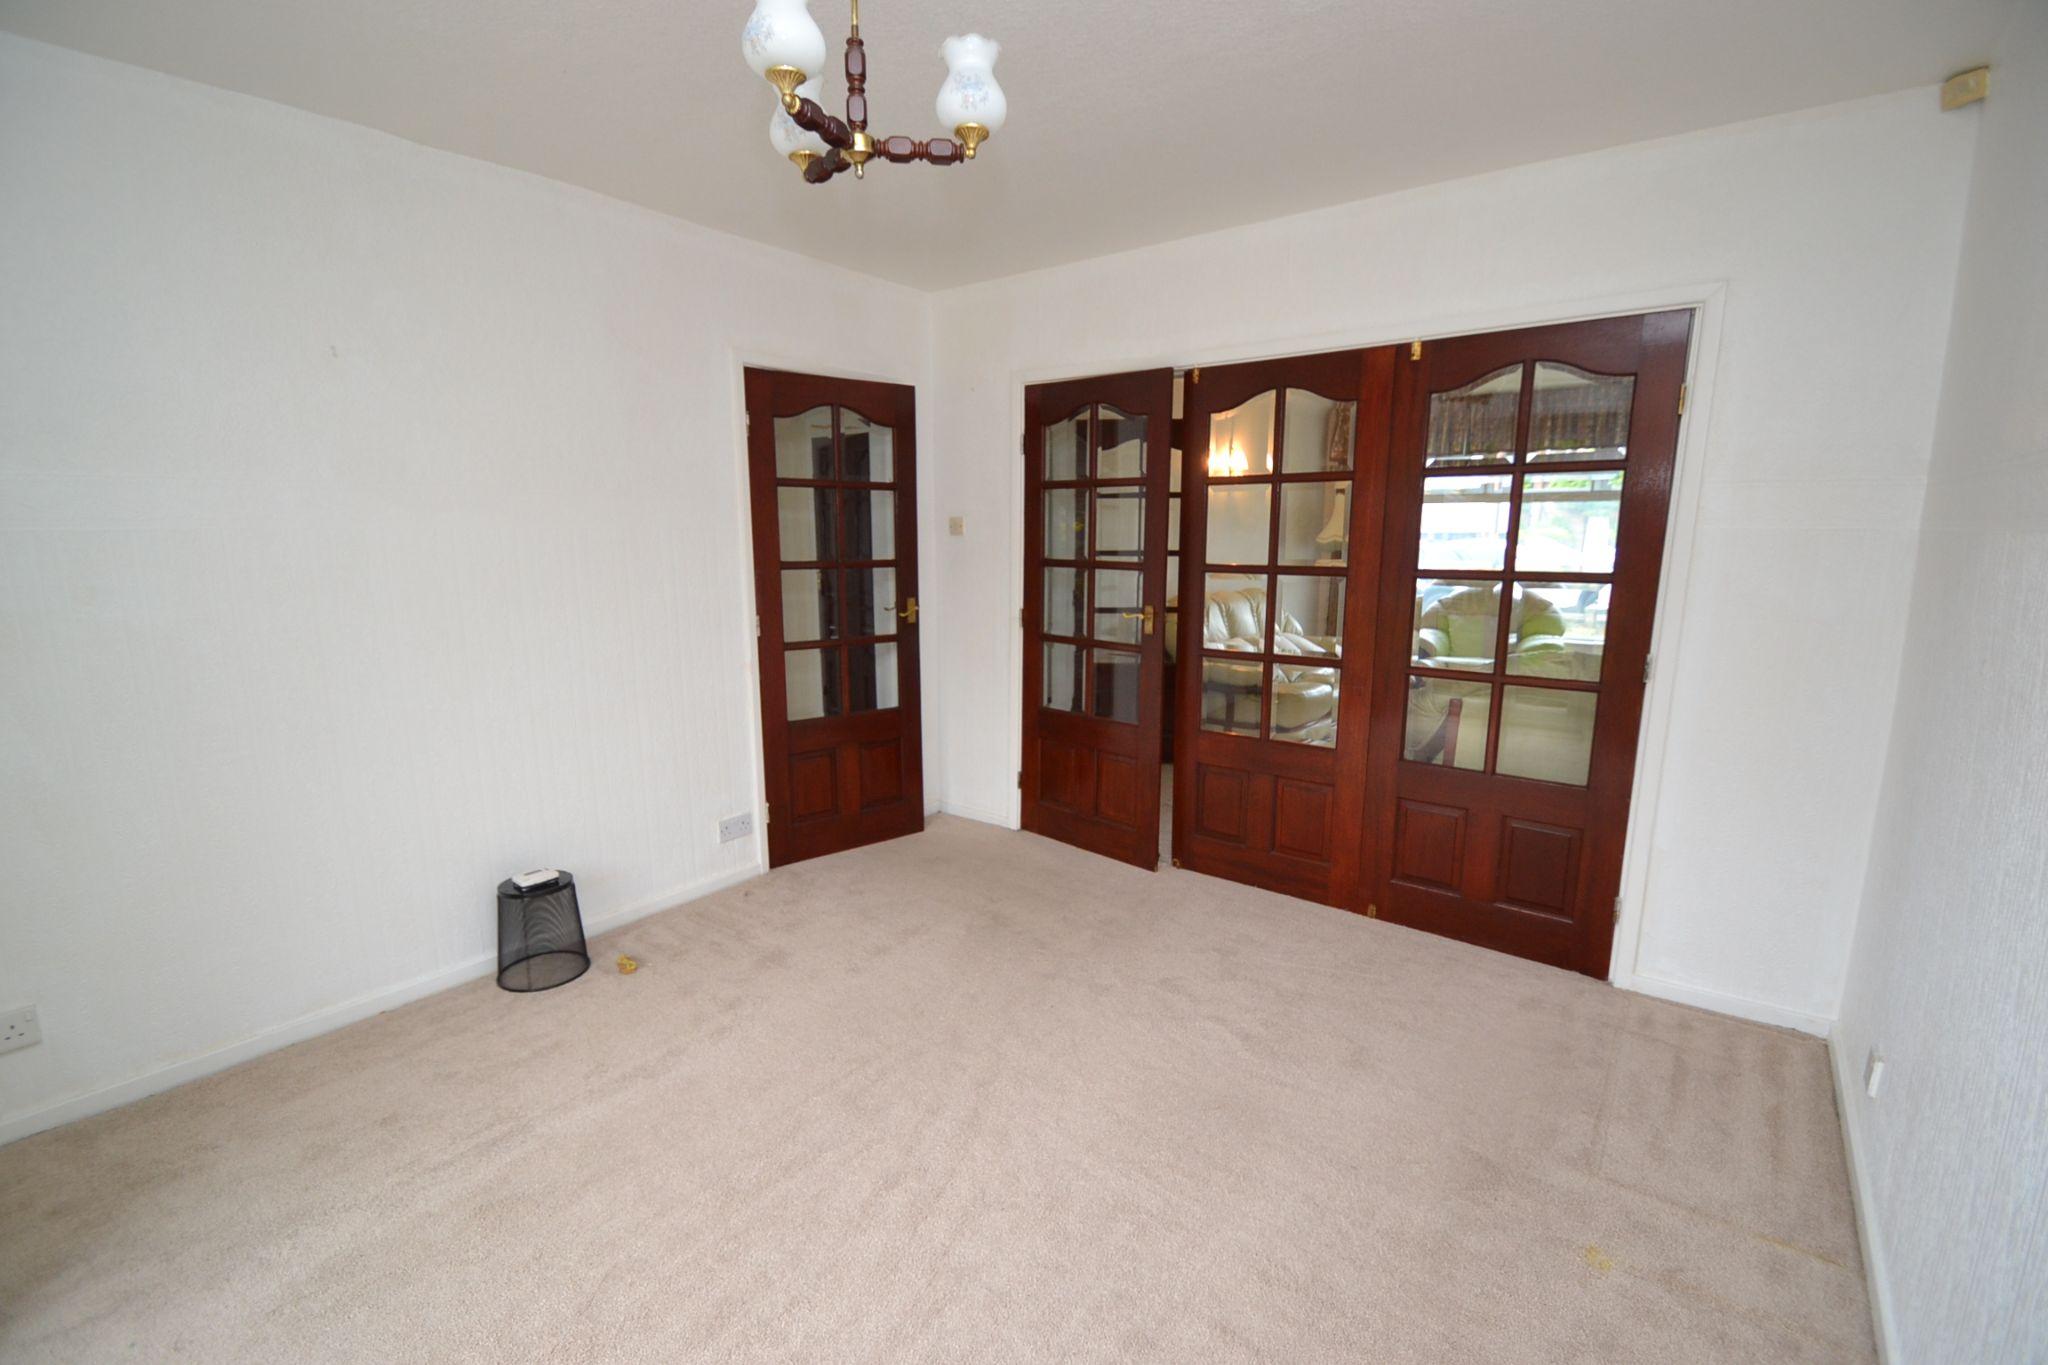 3 Bedroom Semi-detached Dormer House For Sale - Photograph 4